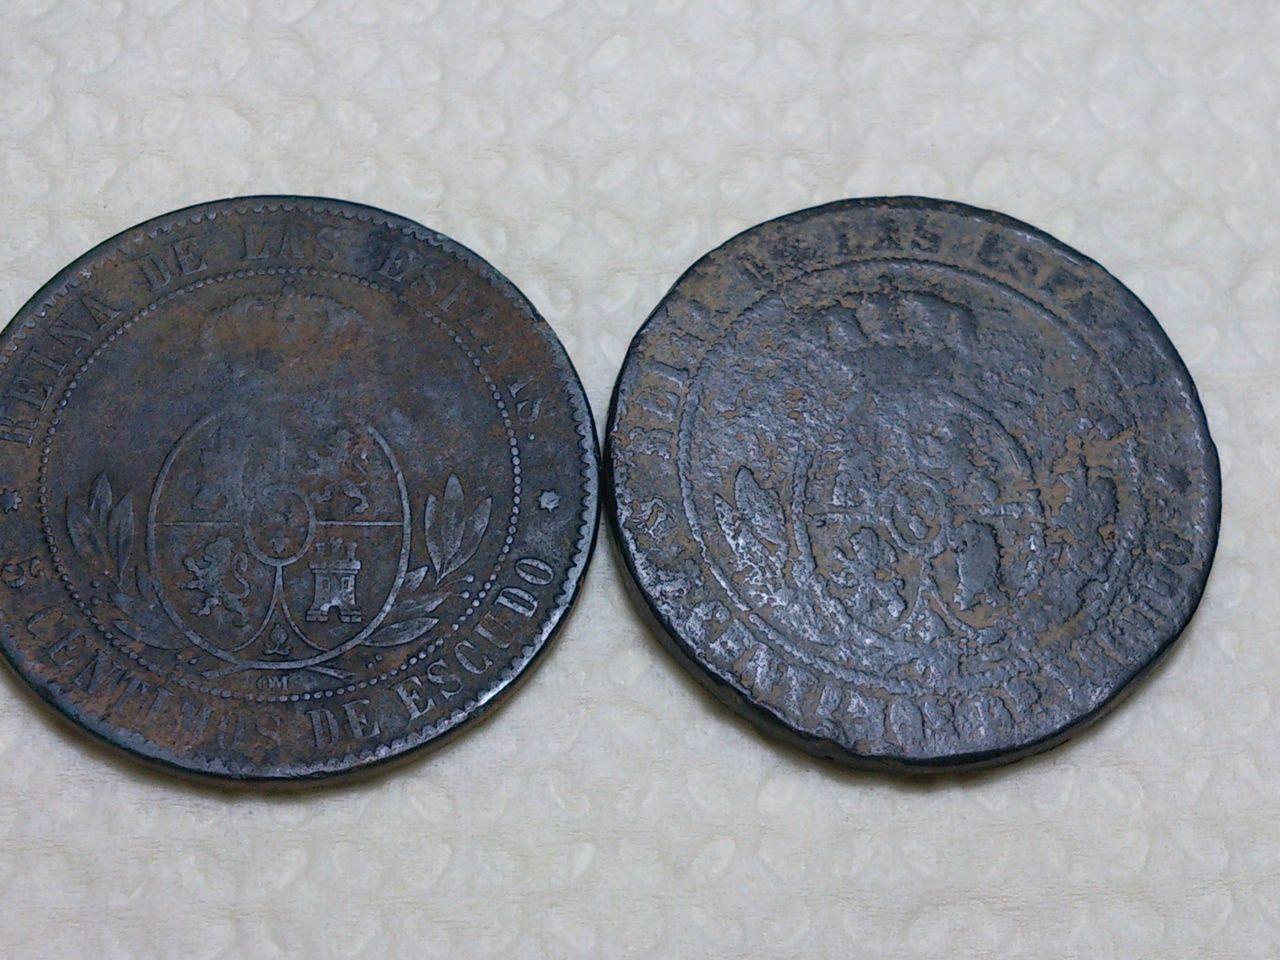 5 Centimos de escudo 1868 Isabel II. Barcelona. - Falsa o fundida? DSC_0309